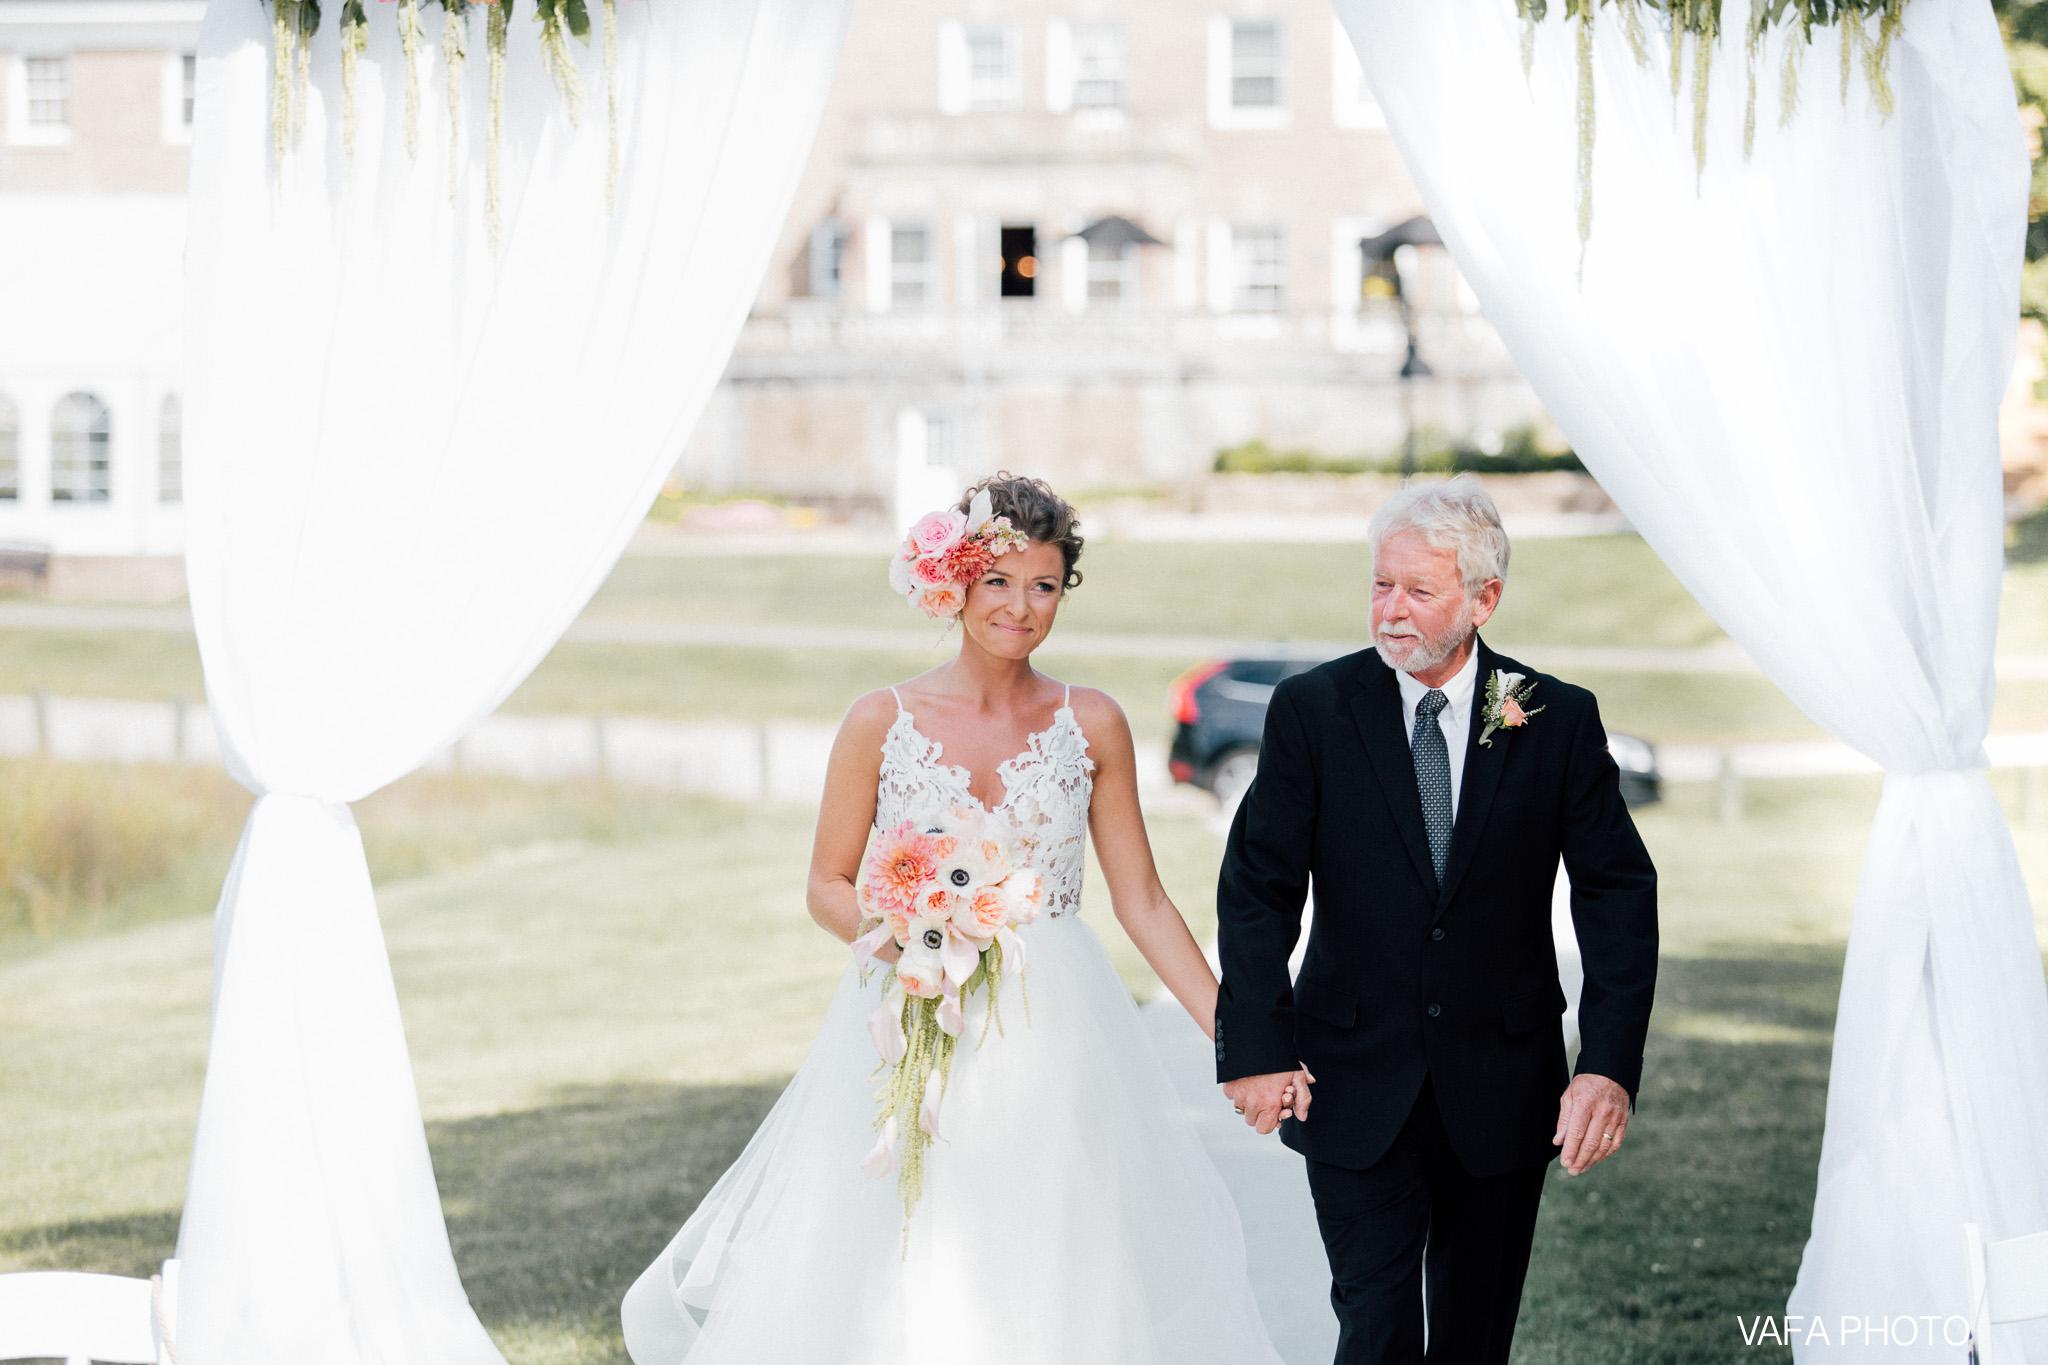 The-Felt-Estate-Wedding-Kailie-David-Vafa-Photo-306.jpg